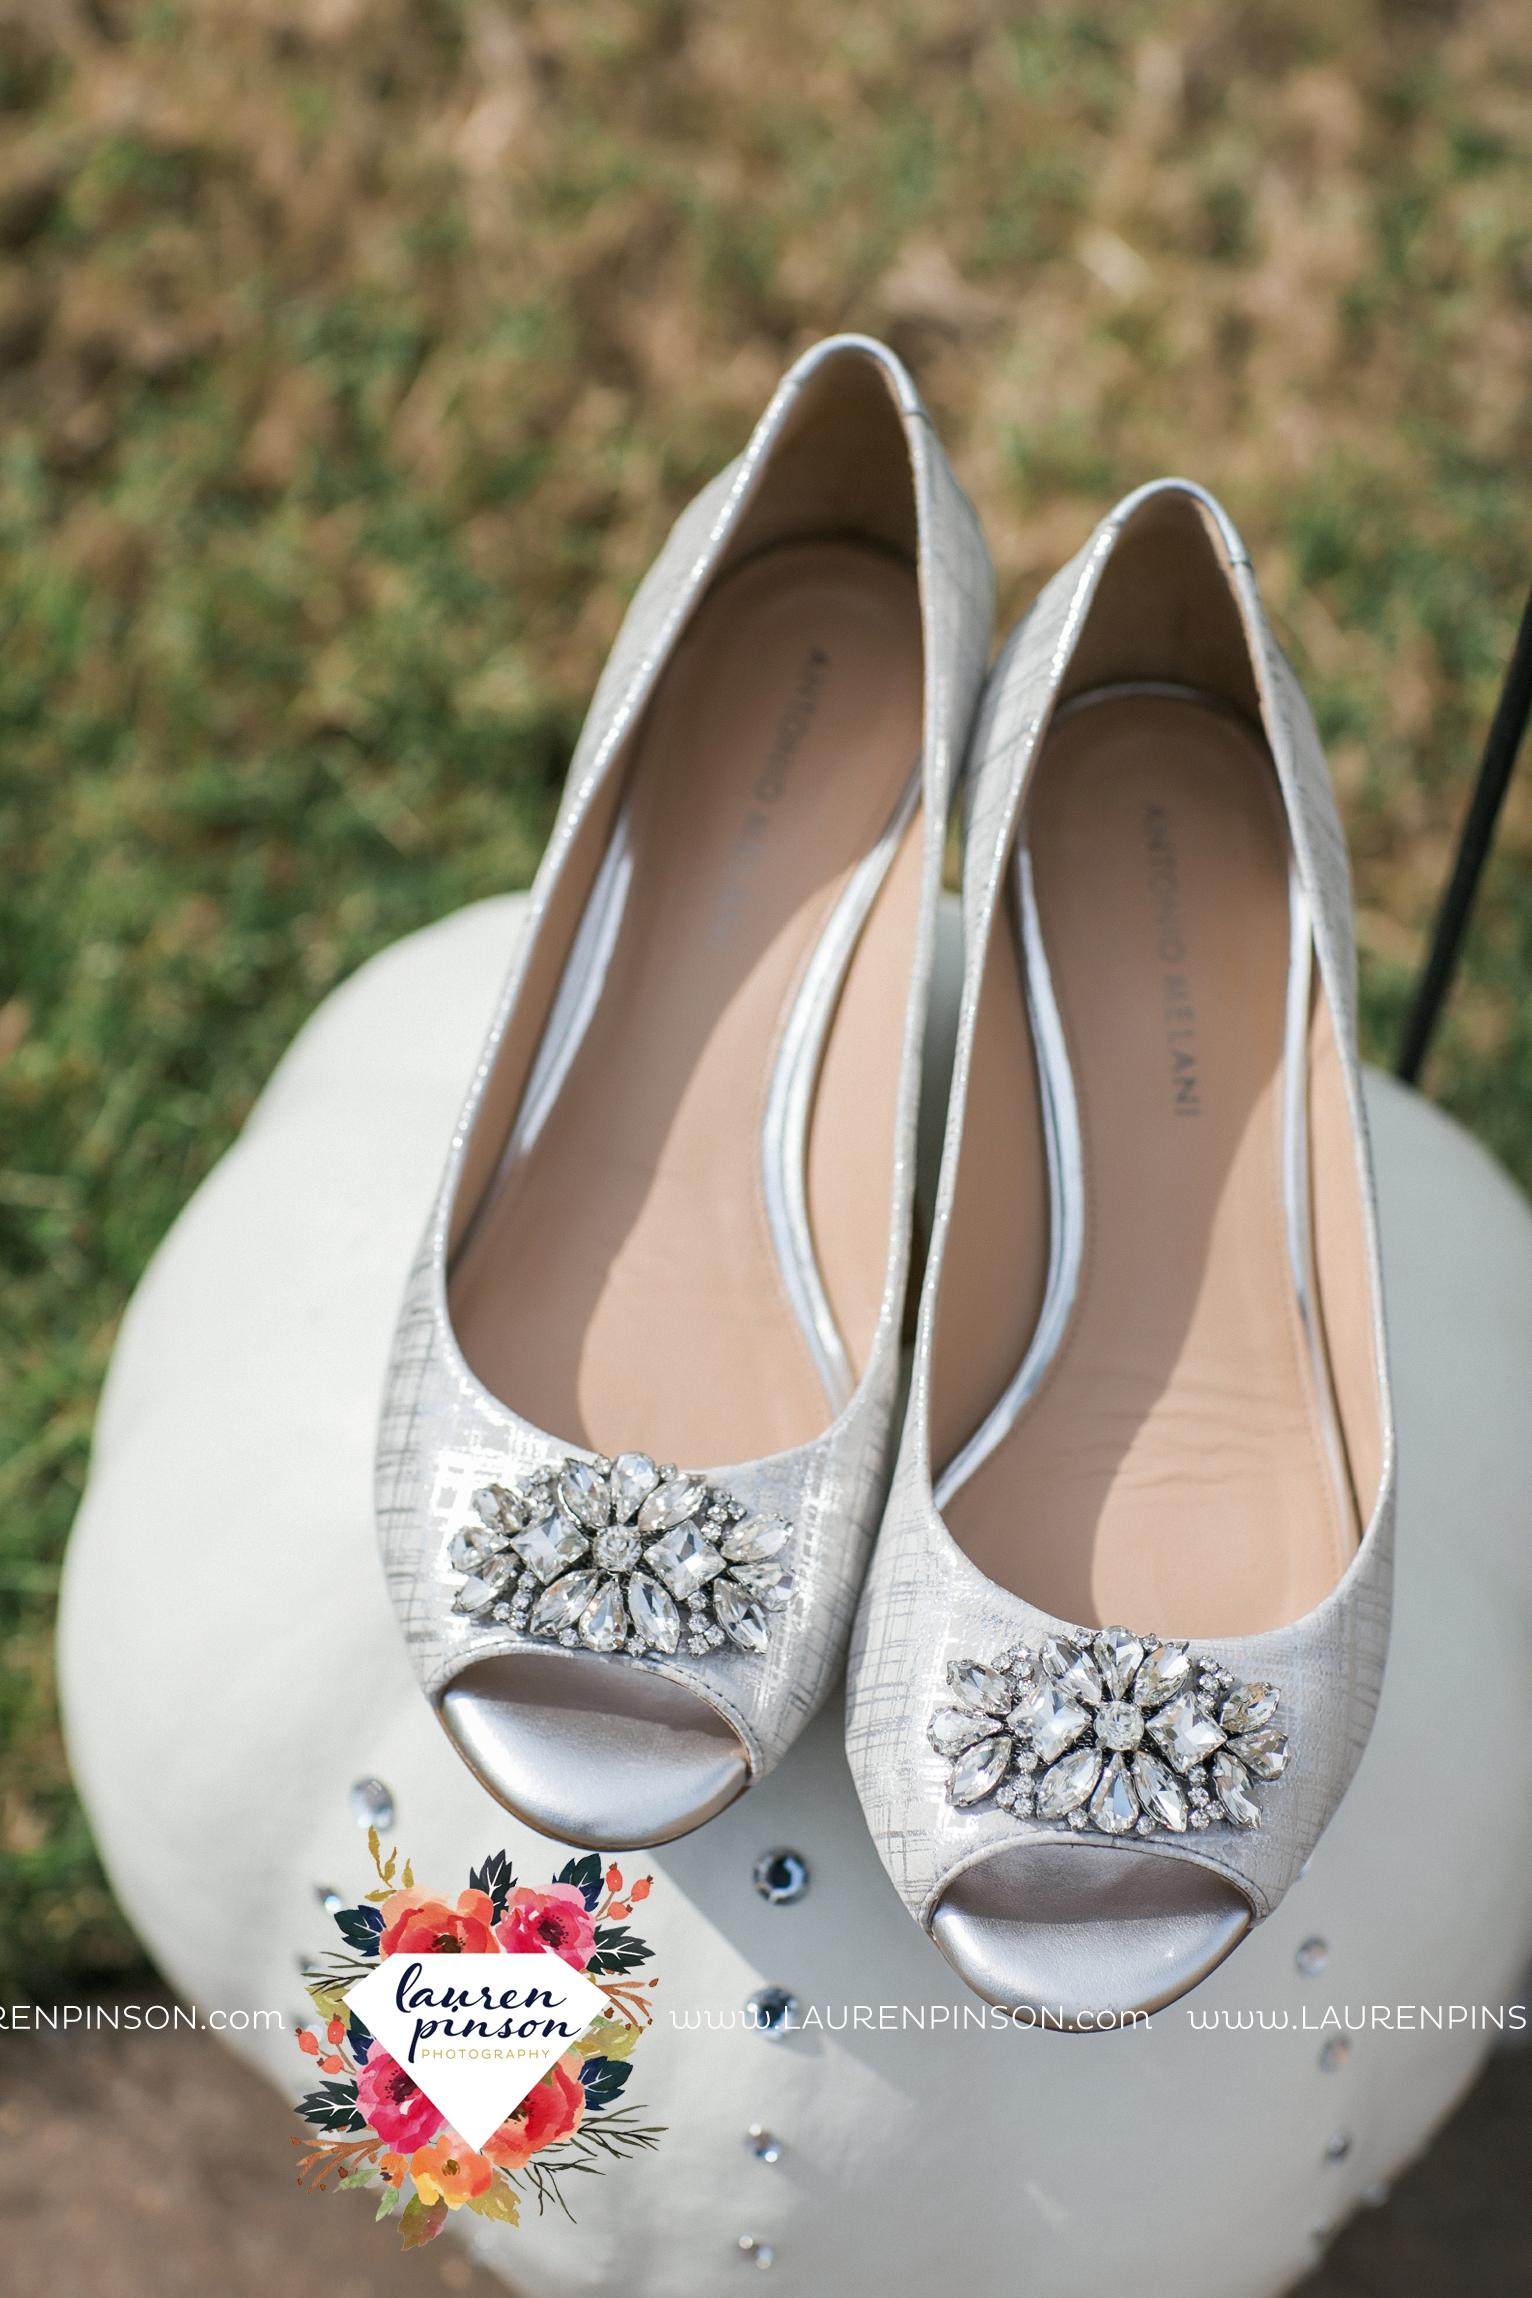 kemp-center-for-the-arts-wichita-falls-texas-wedding-photographer-fall-wedding-pumpkins-116.jpg